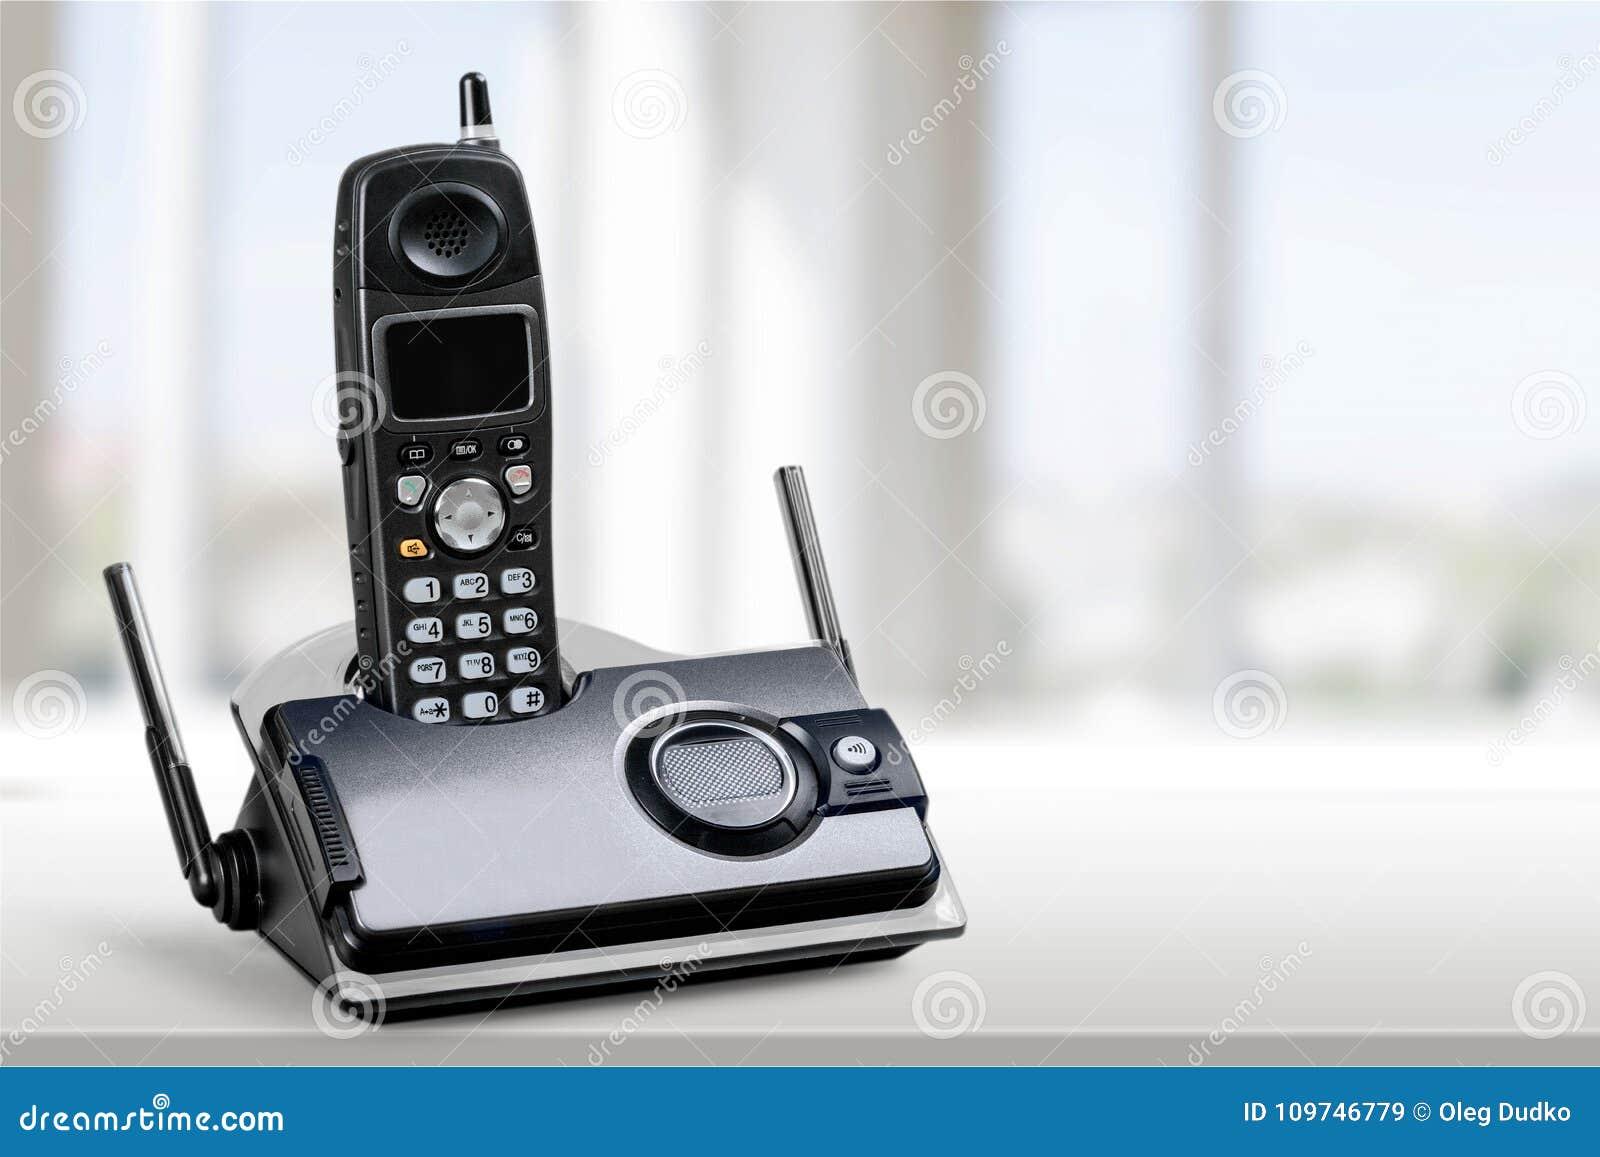 Cordless modern Phone, close-up view